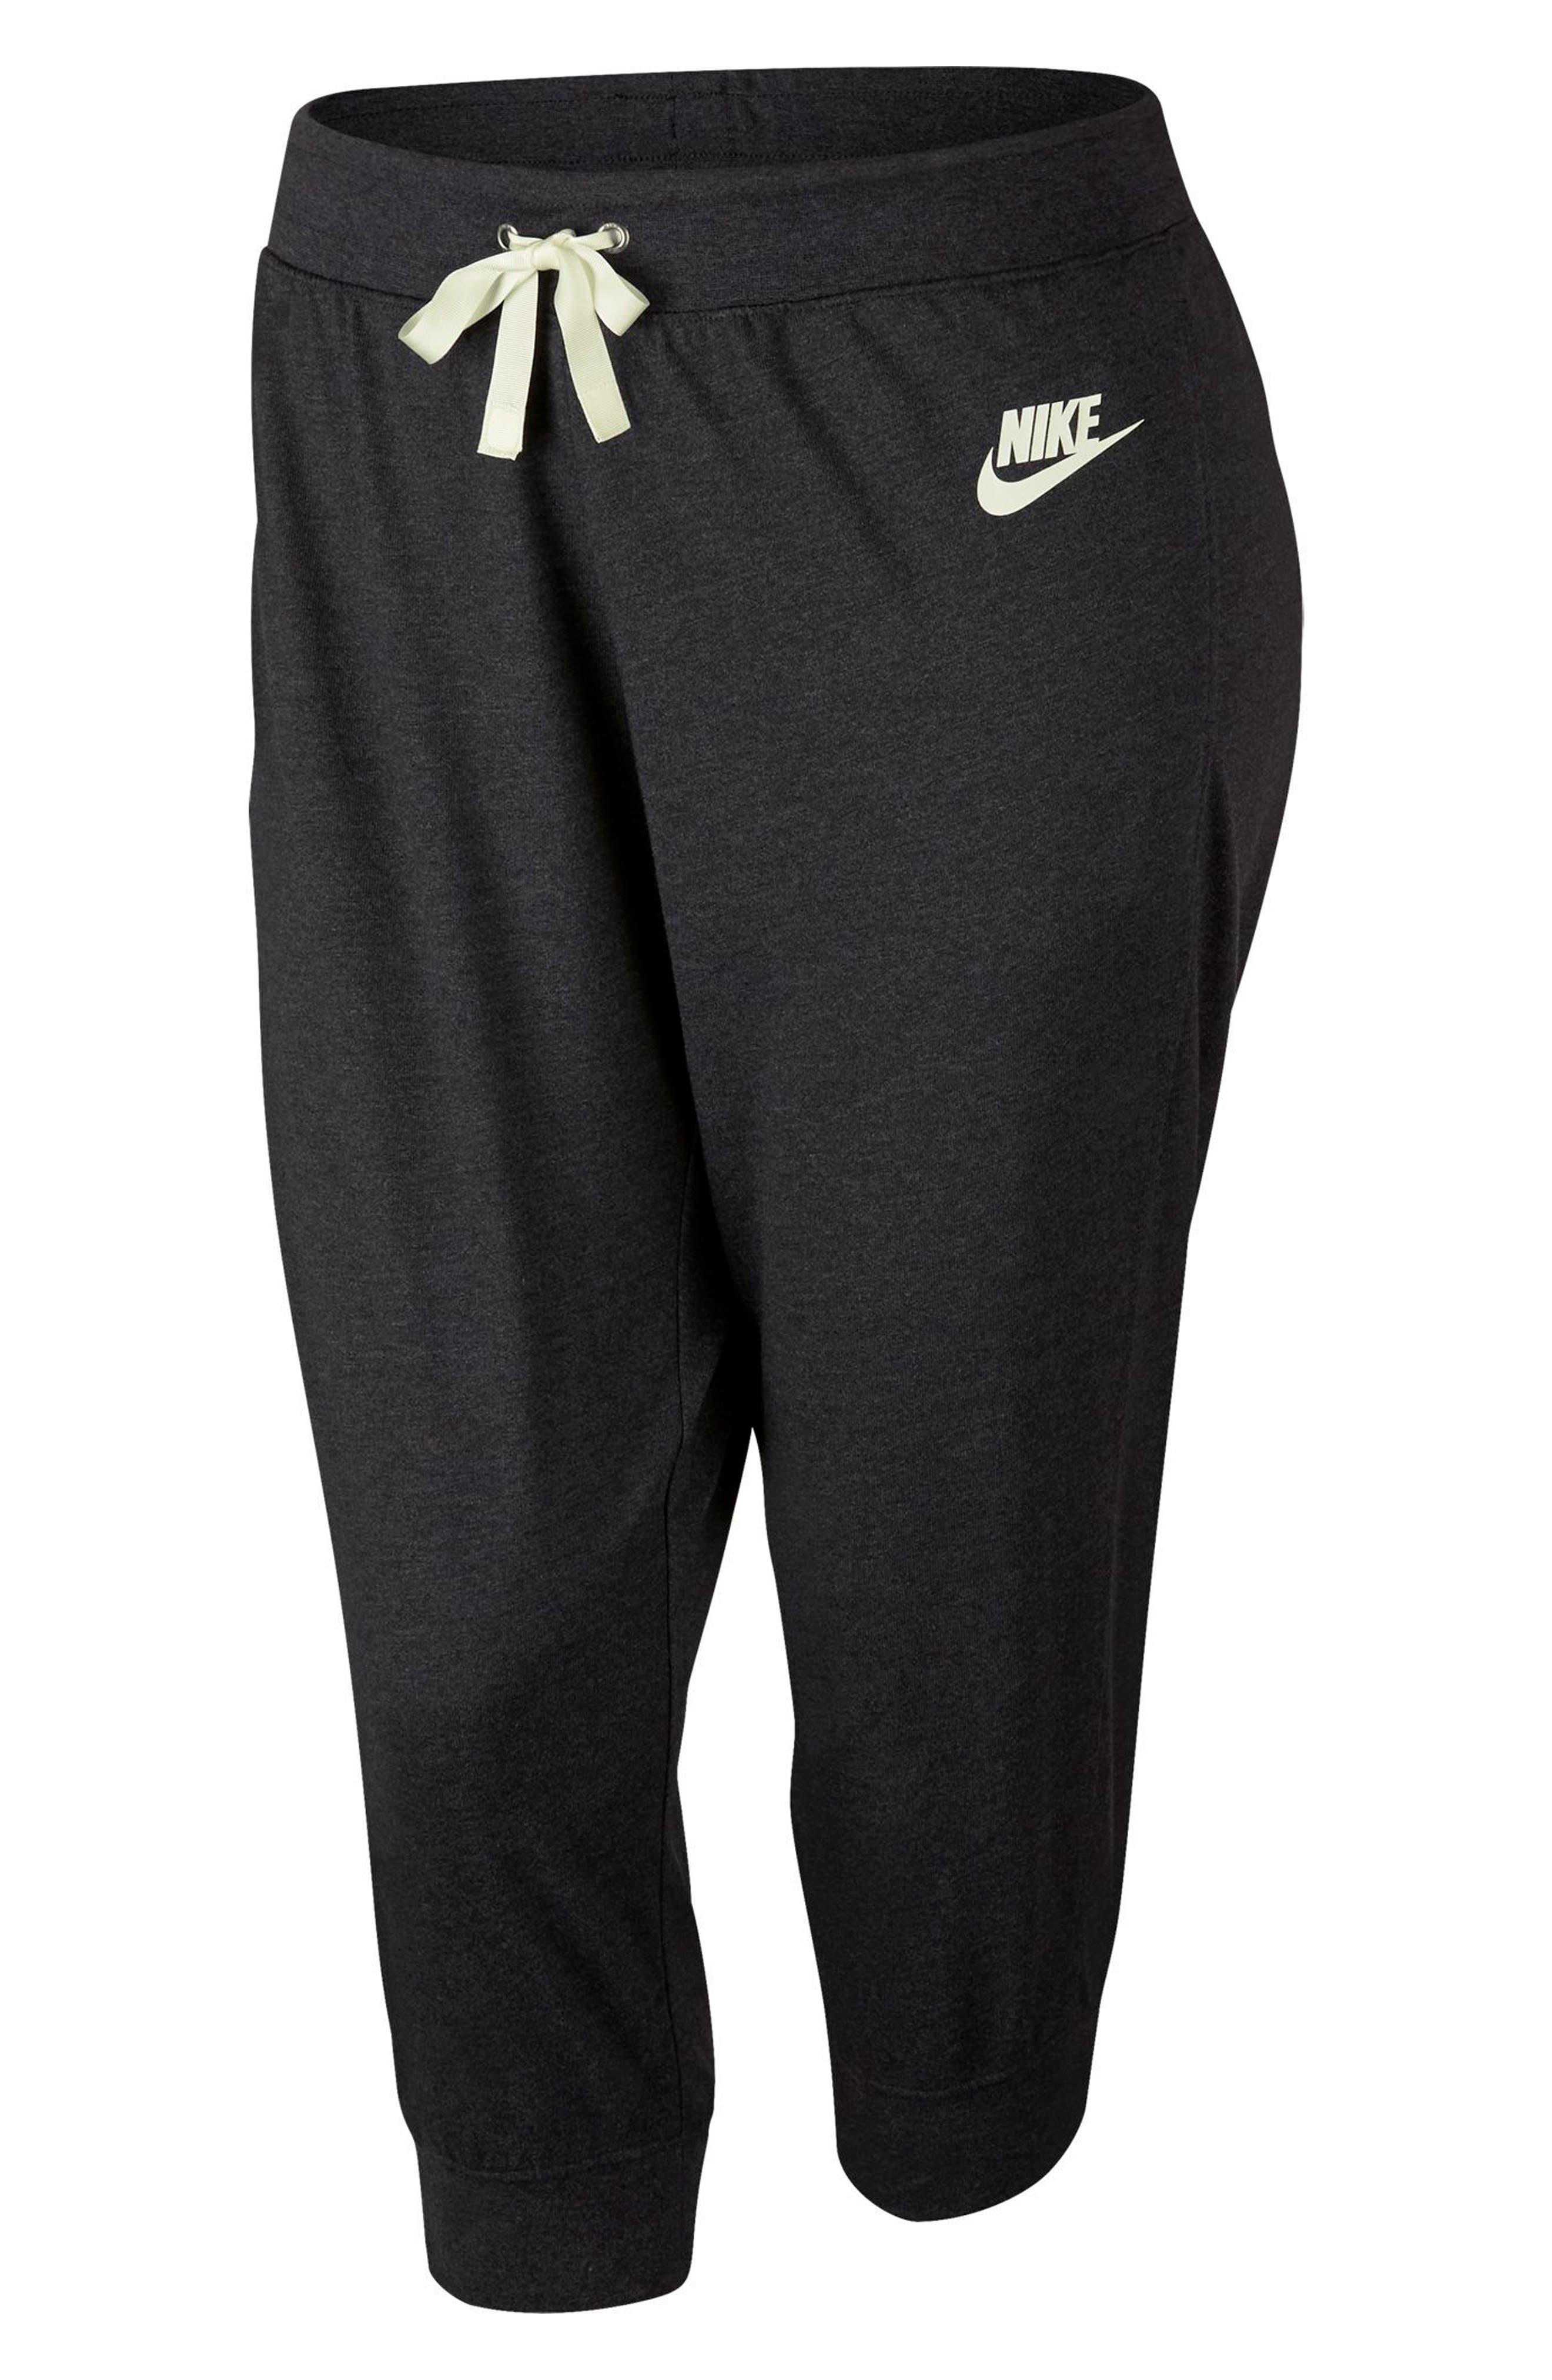 Sportswear Gym Capris,                             Alternate thumbnail 7, color,                             Black Heather/ Sail